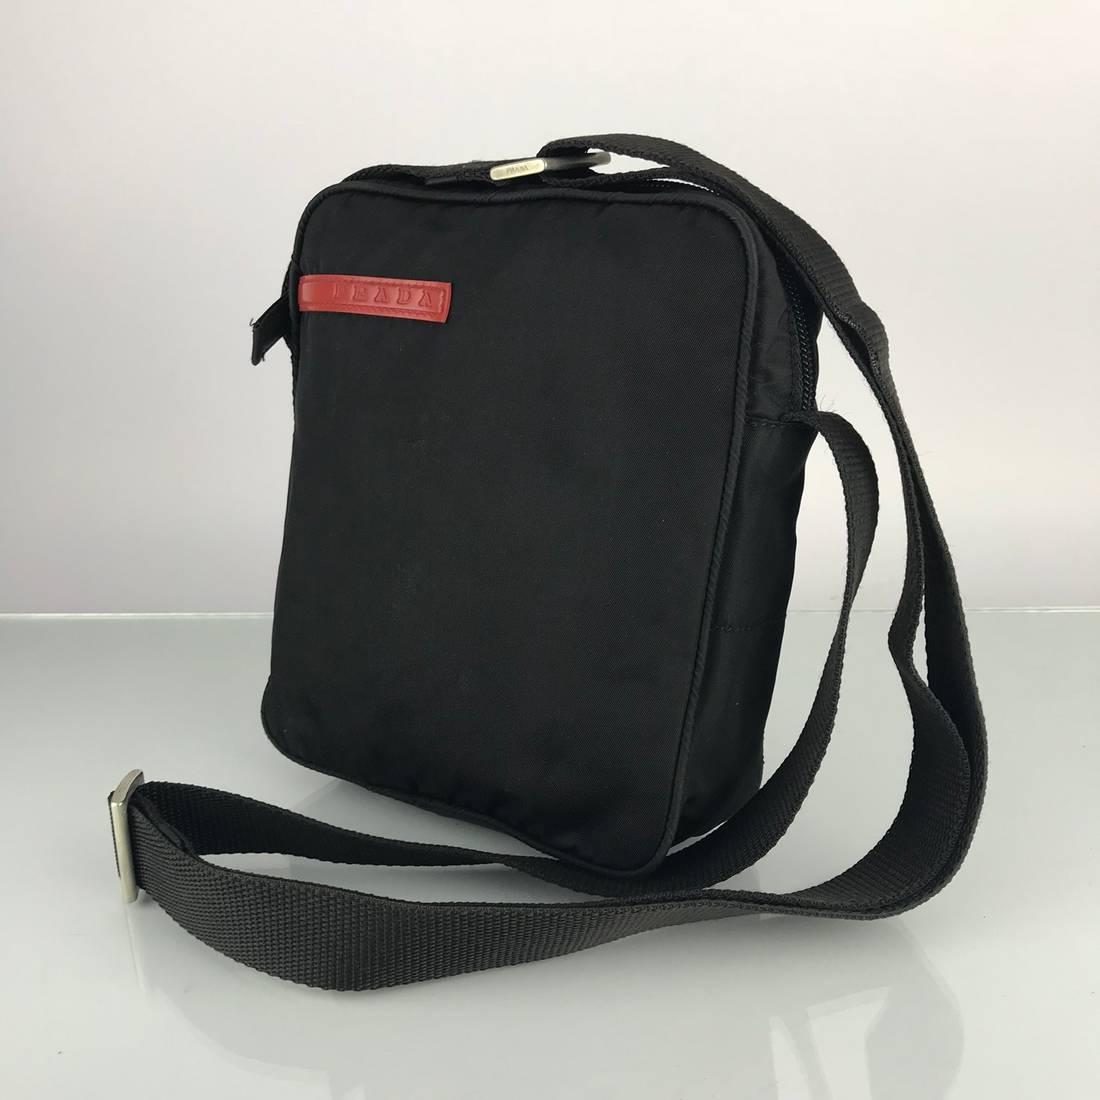 7970e45d5b2 ... norway prada authentic prada sport black nylon crossbody bag size one  size 2 6cbb3 be37f ...